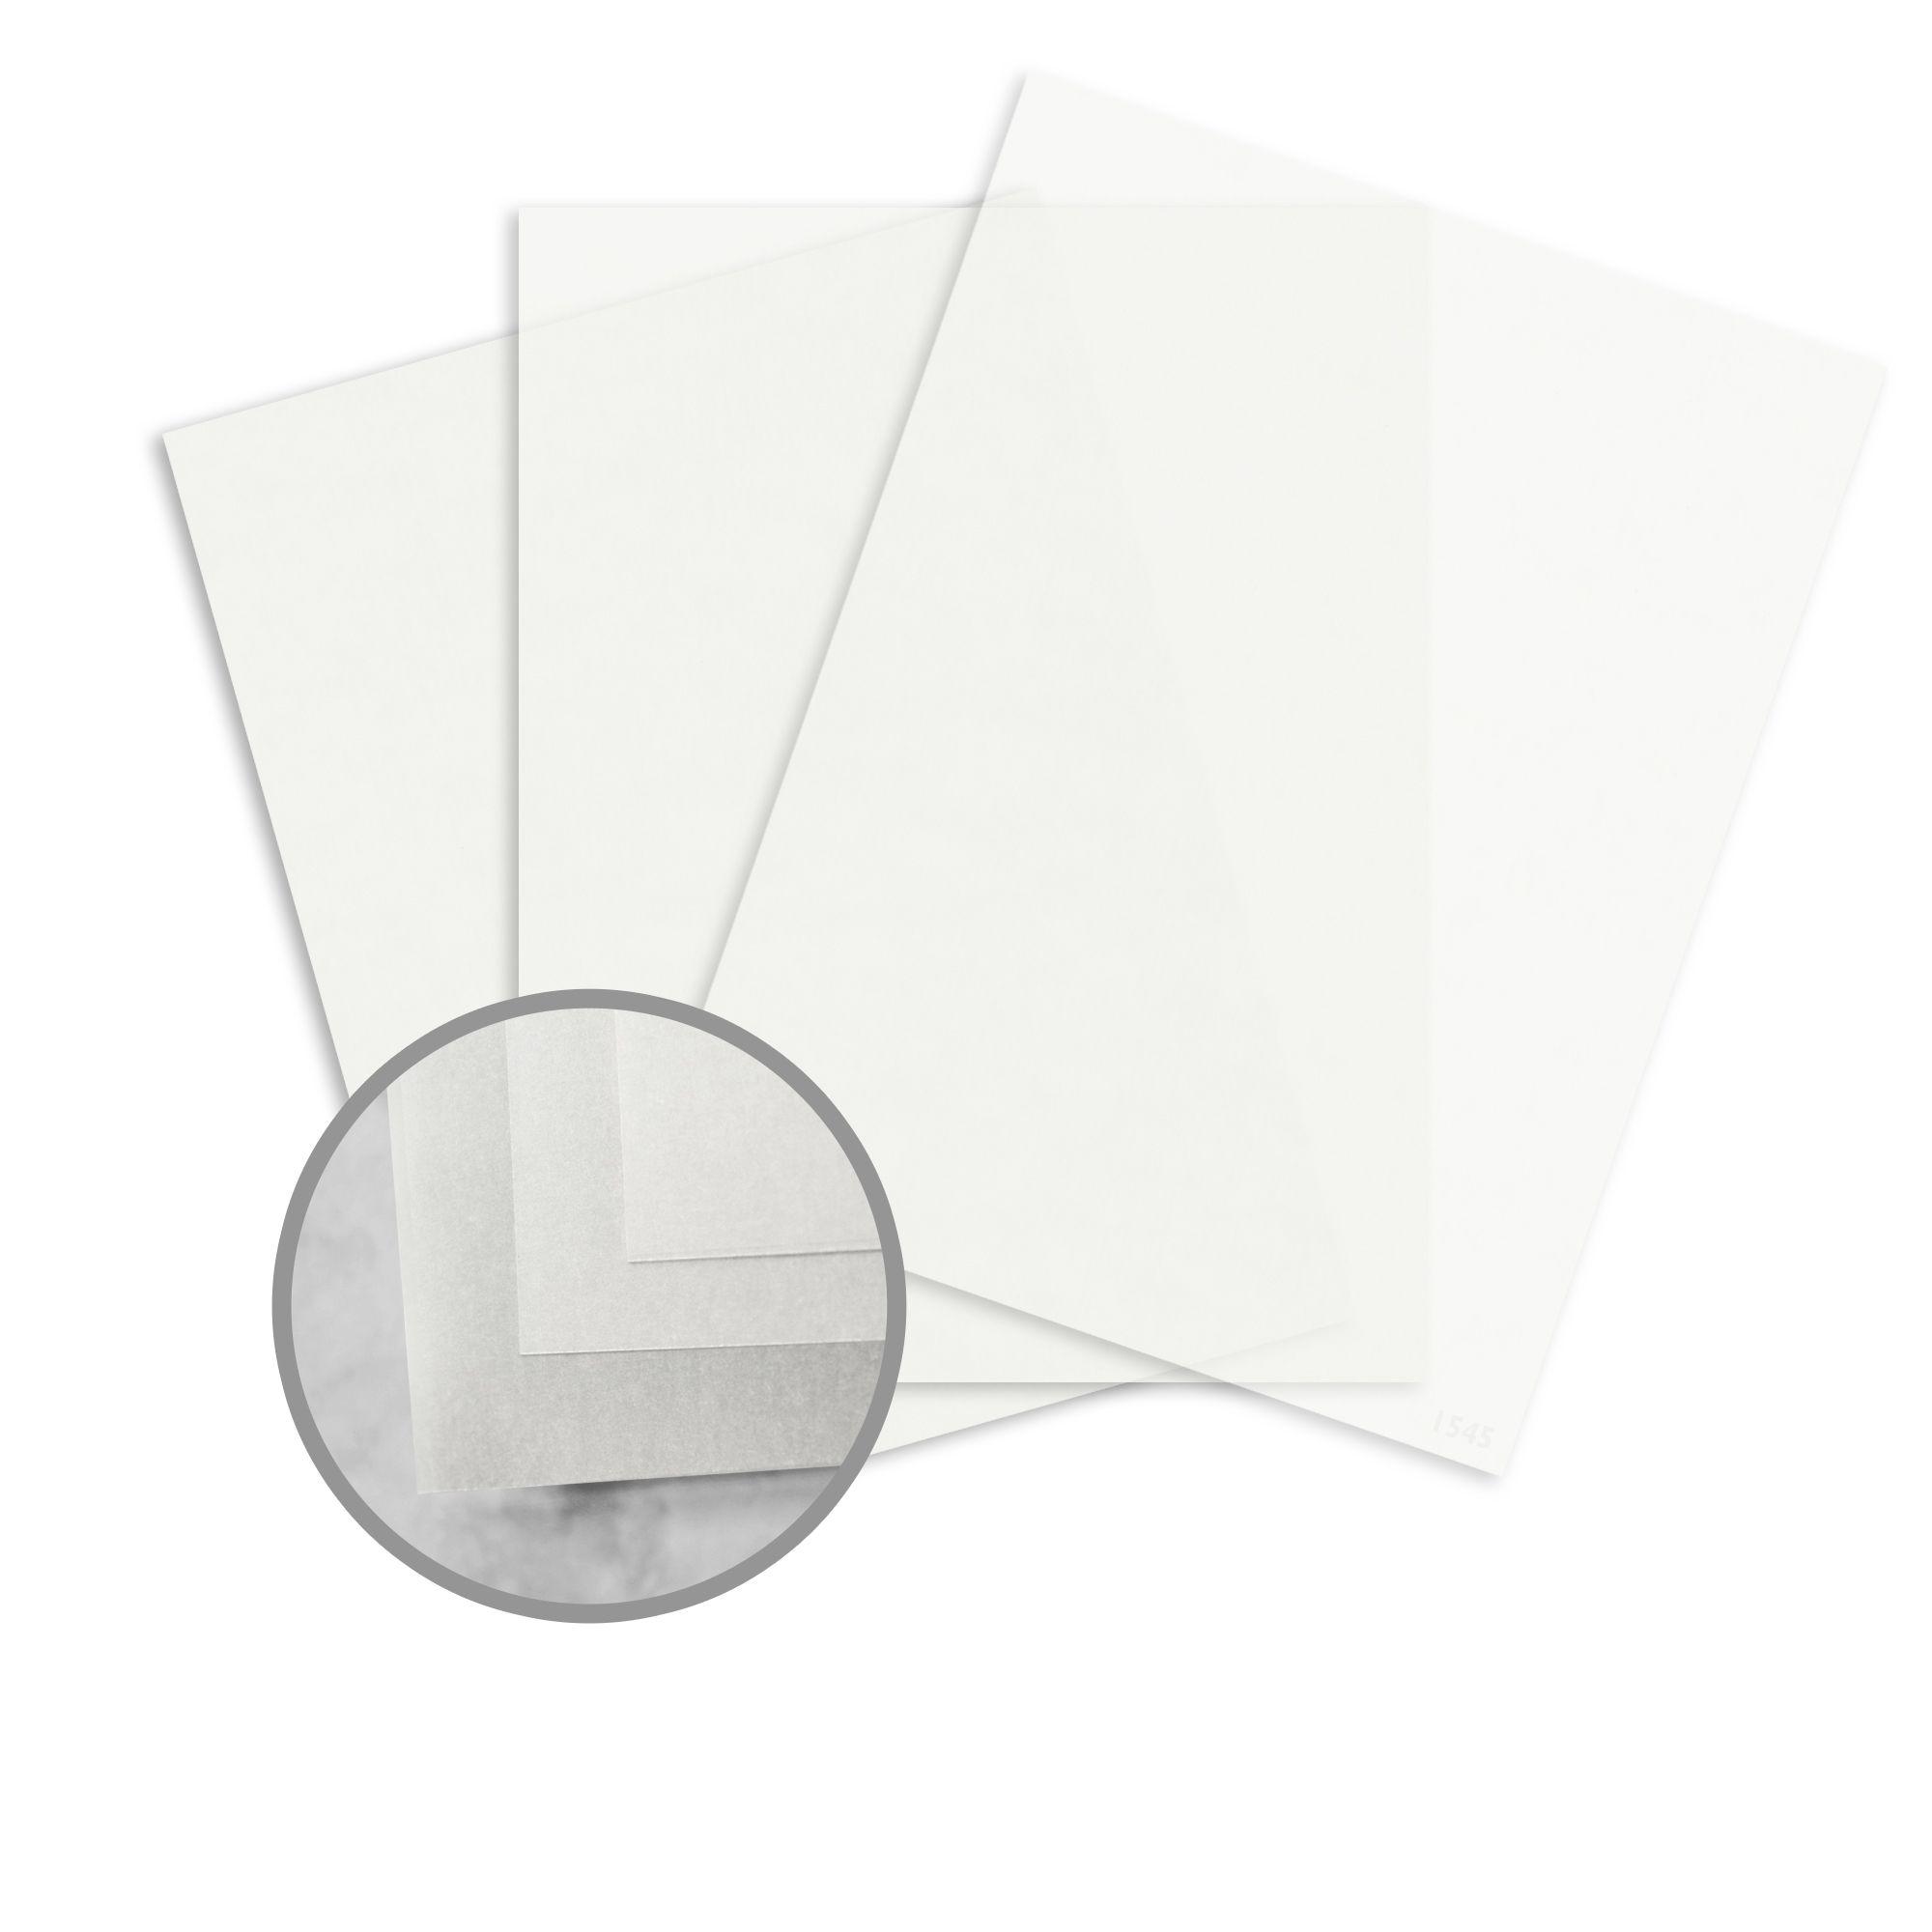 100 Vellum Sheets 8 12 x 11 Size Green Translucent Vellum Paper